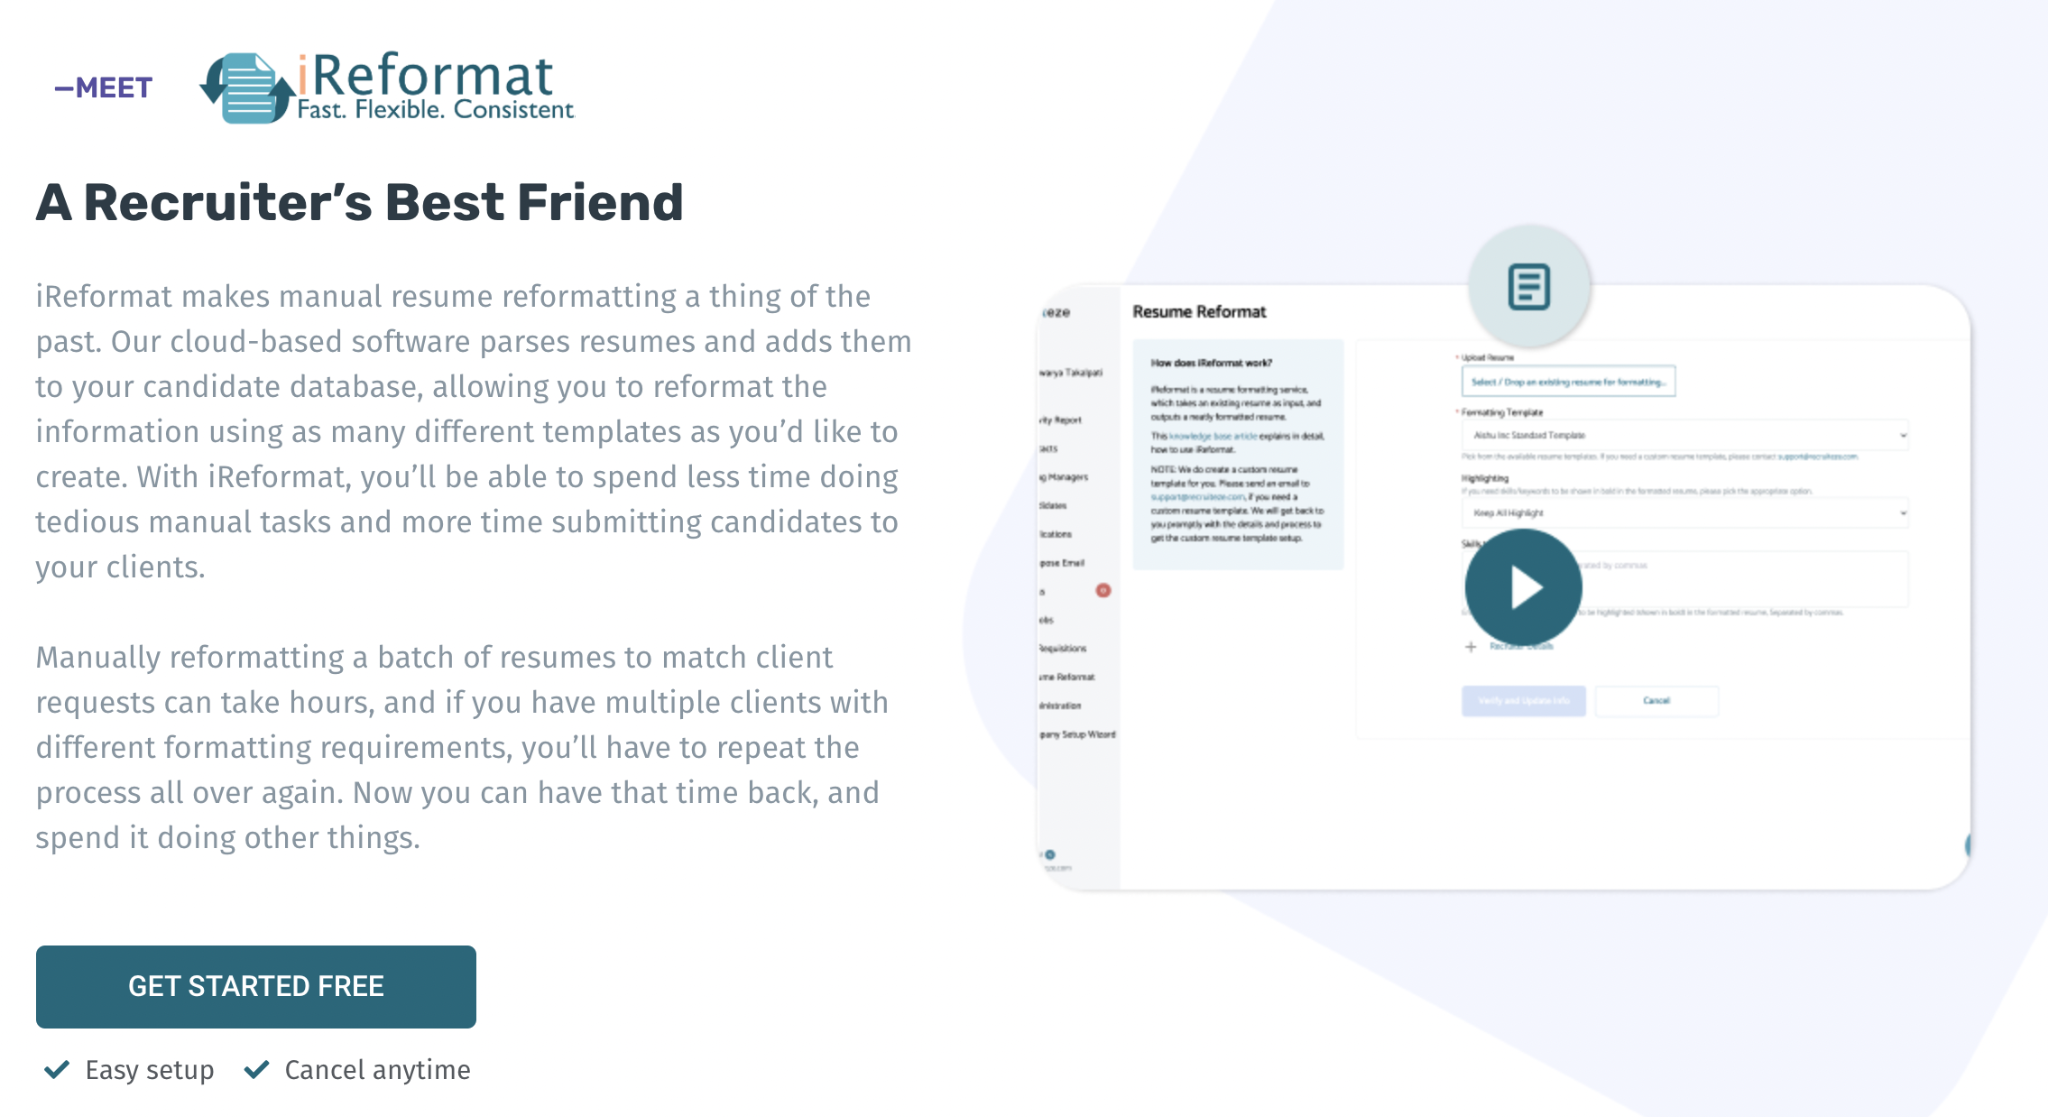 Start using iReformat today